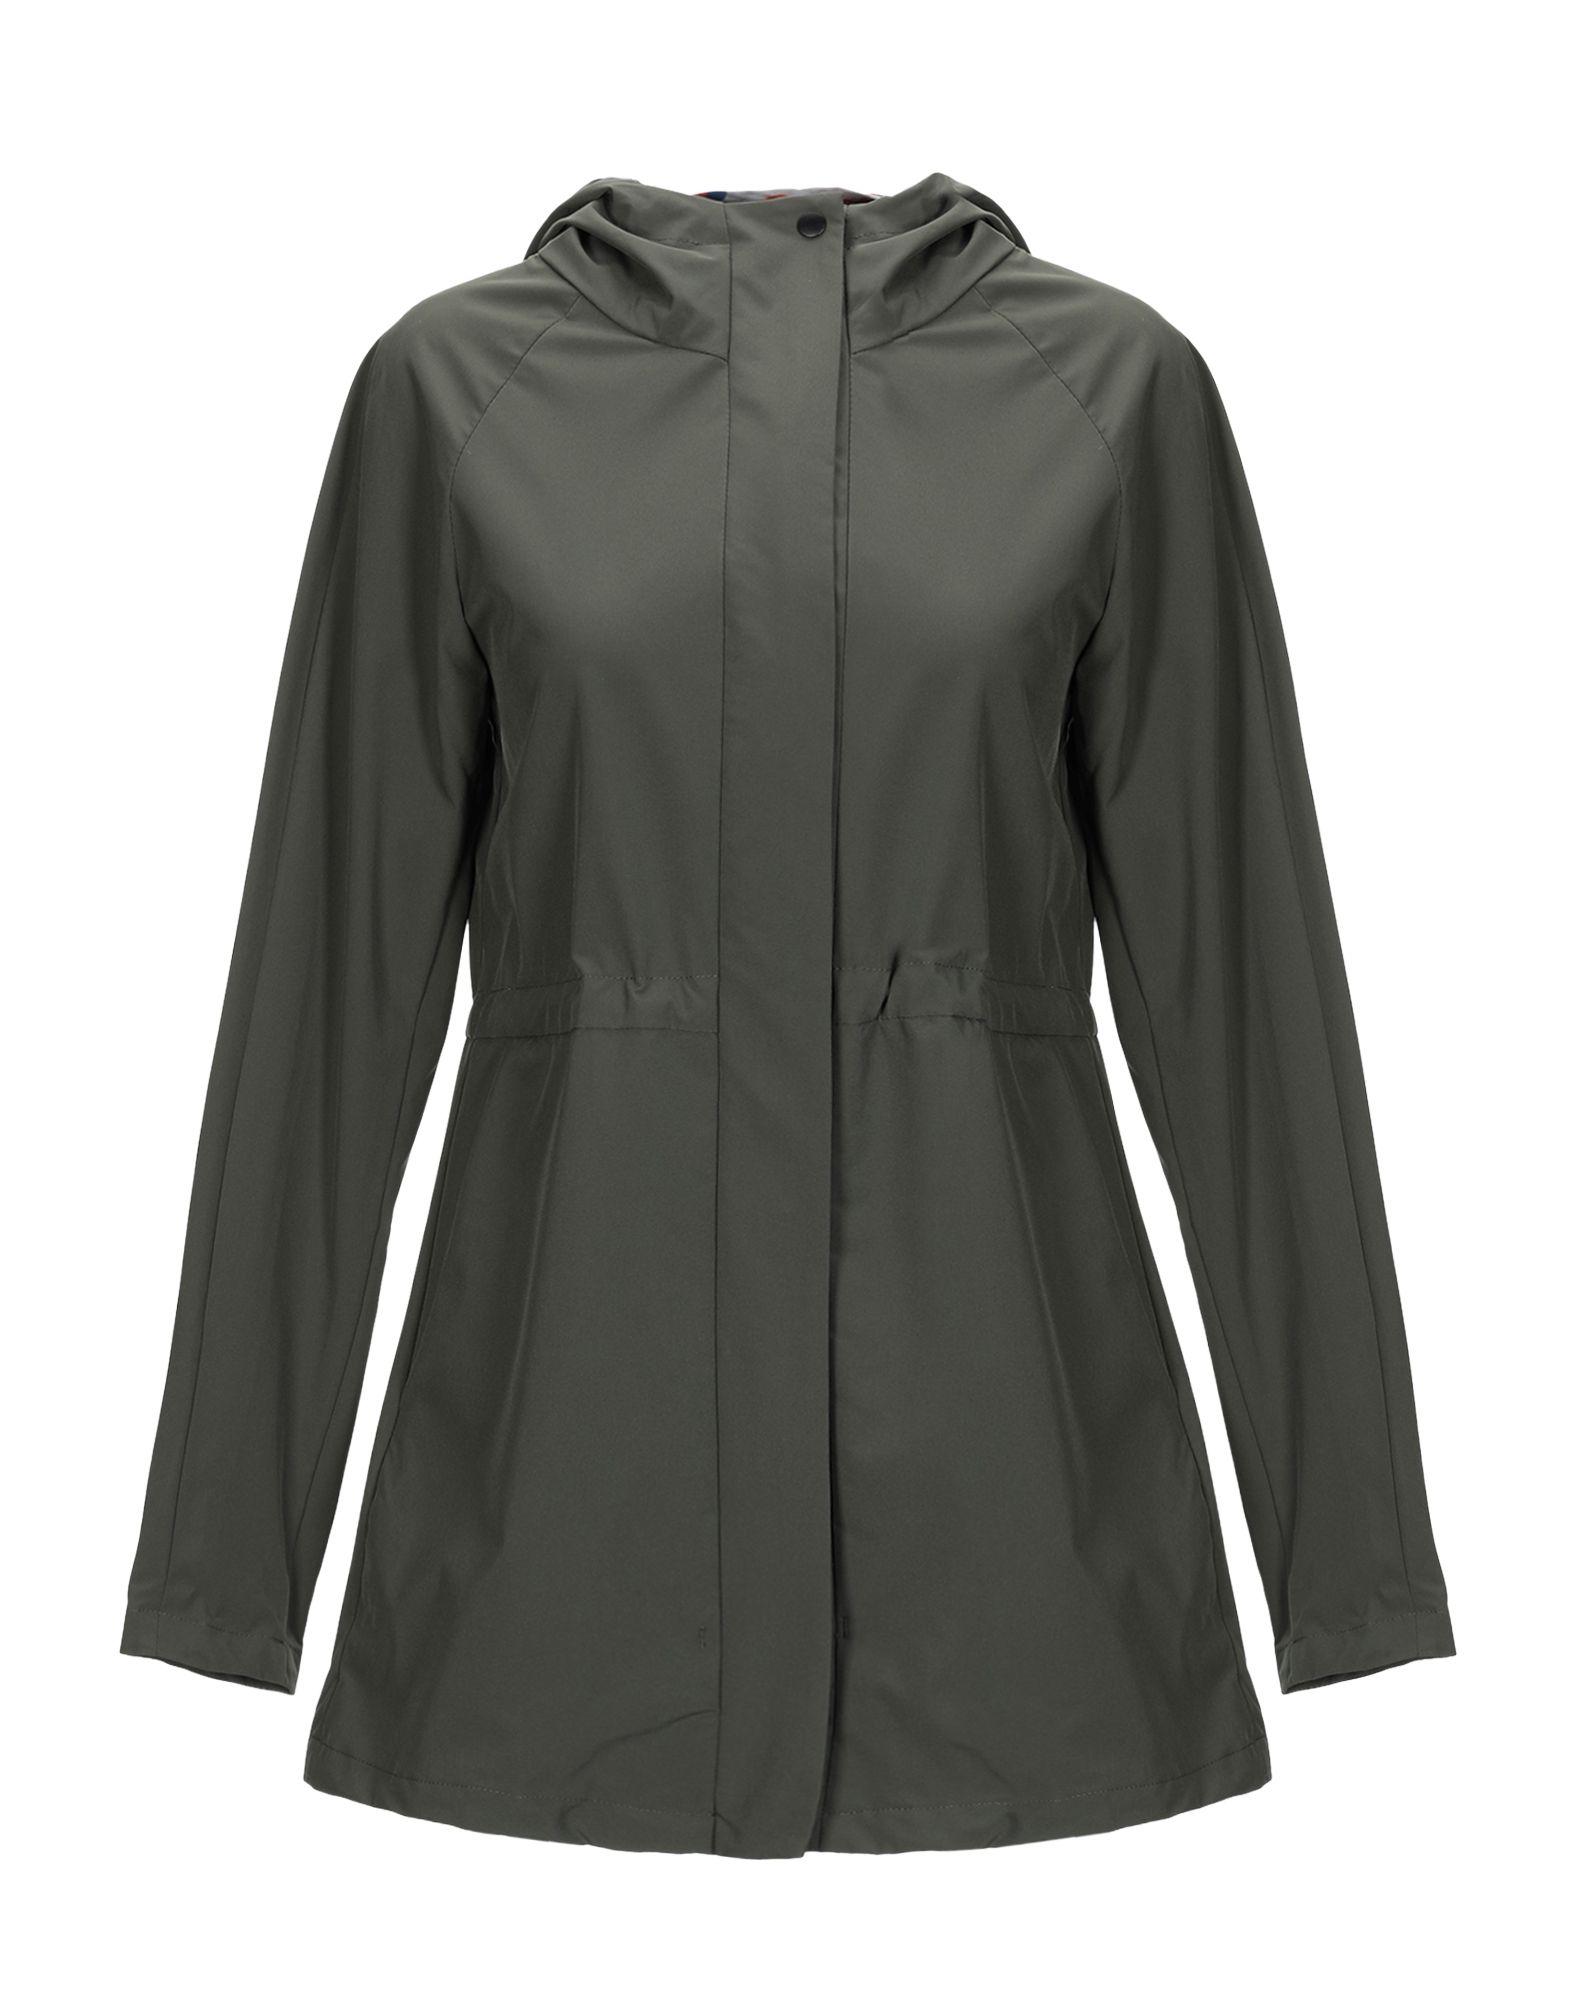 Yuko Coats   Jackets - Yuko Women - YOOX United States 20ea6ec02d3